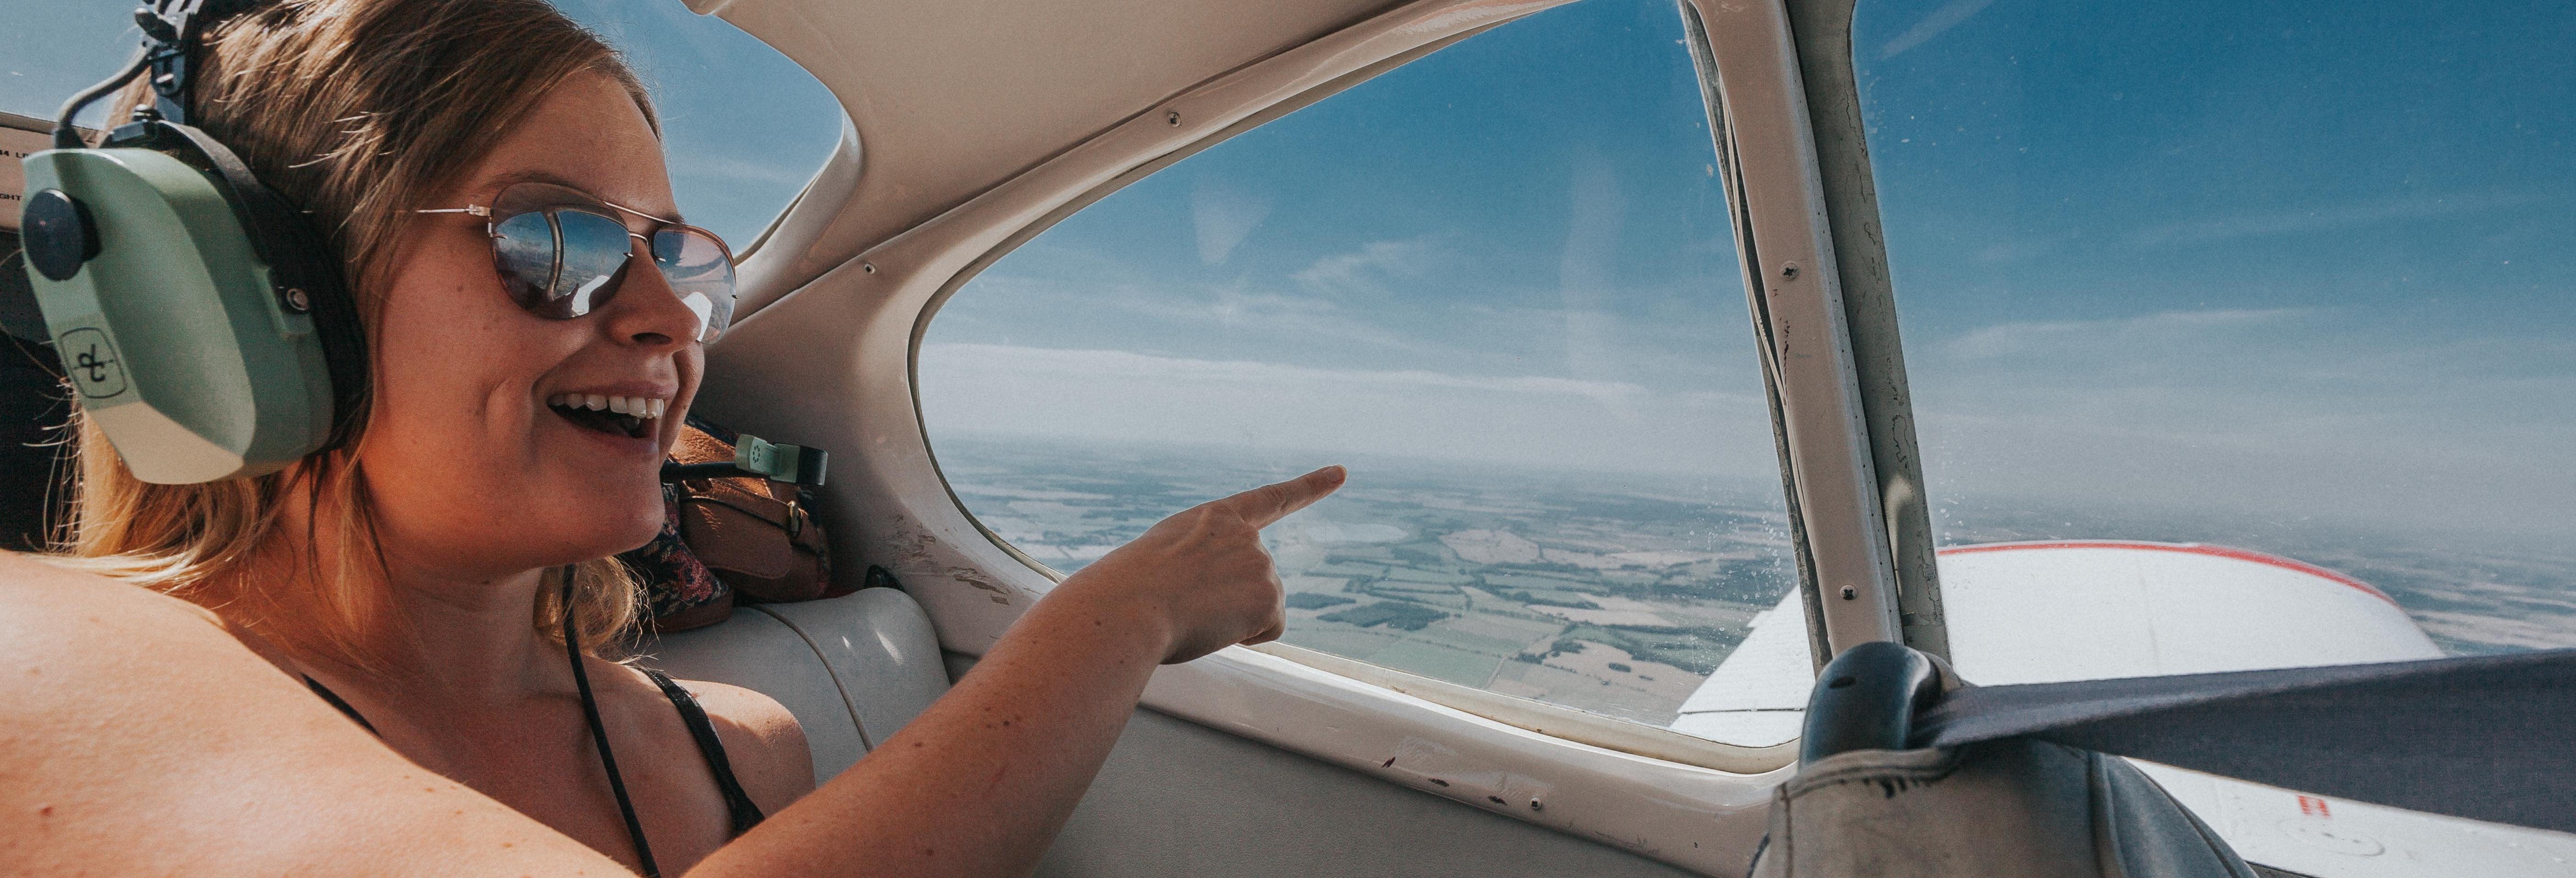 Paseo en avioneta por Portsmouth